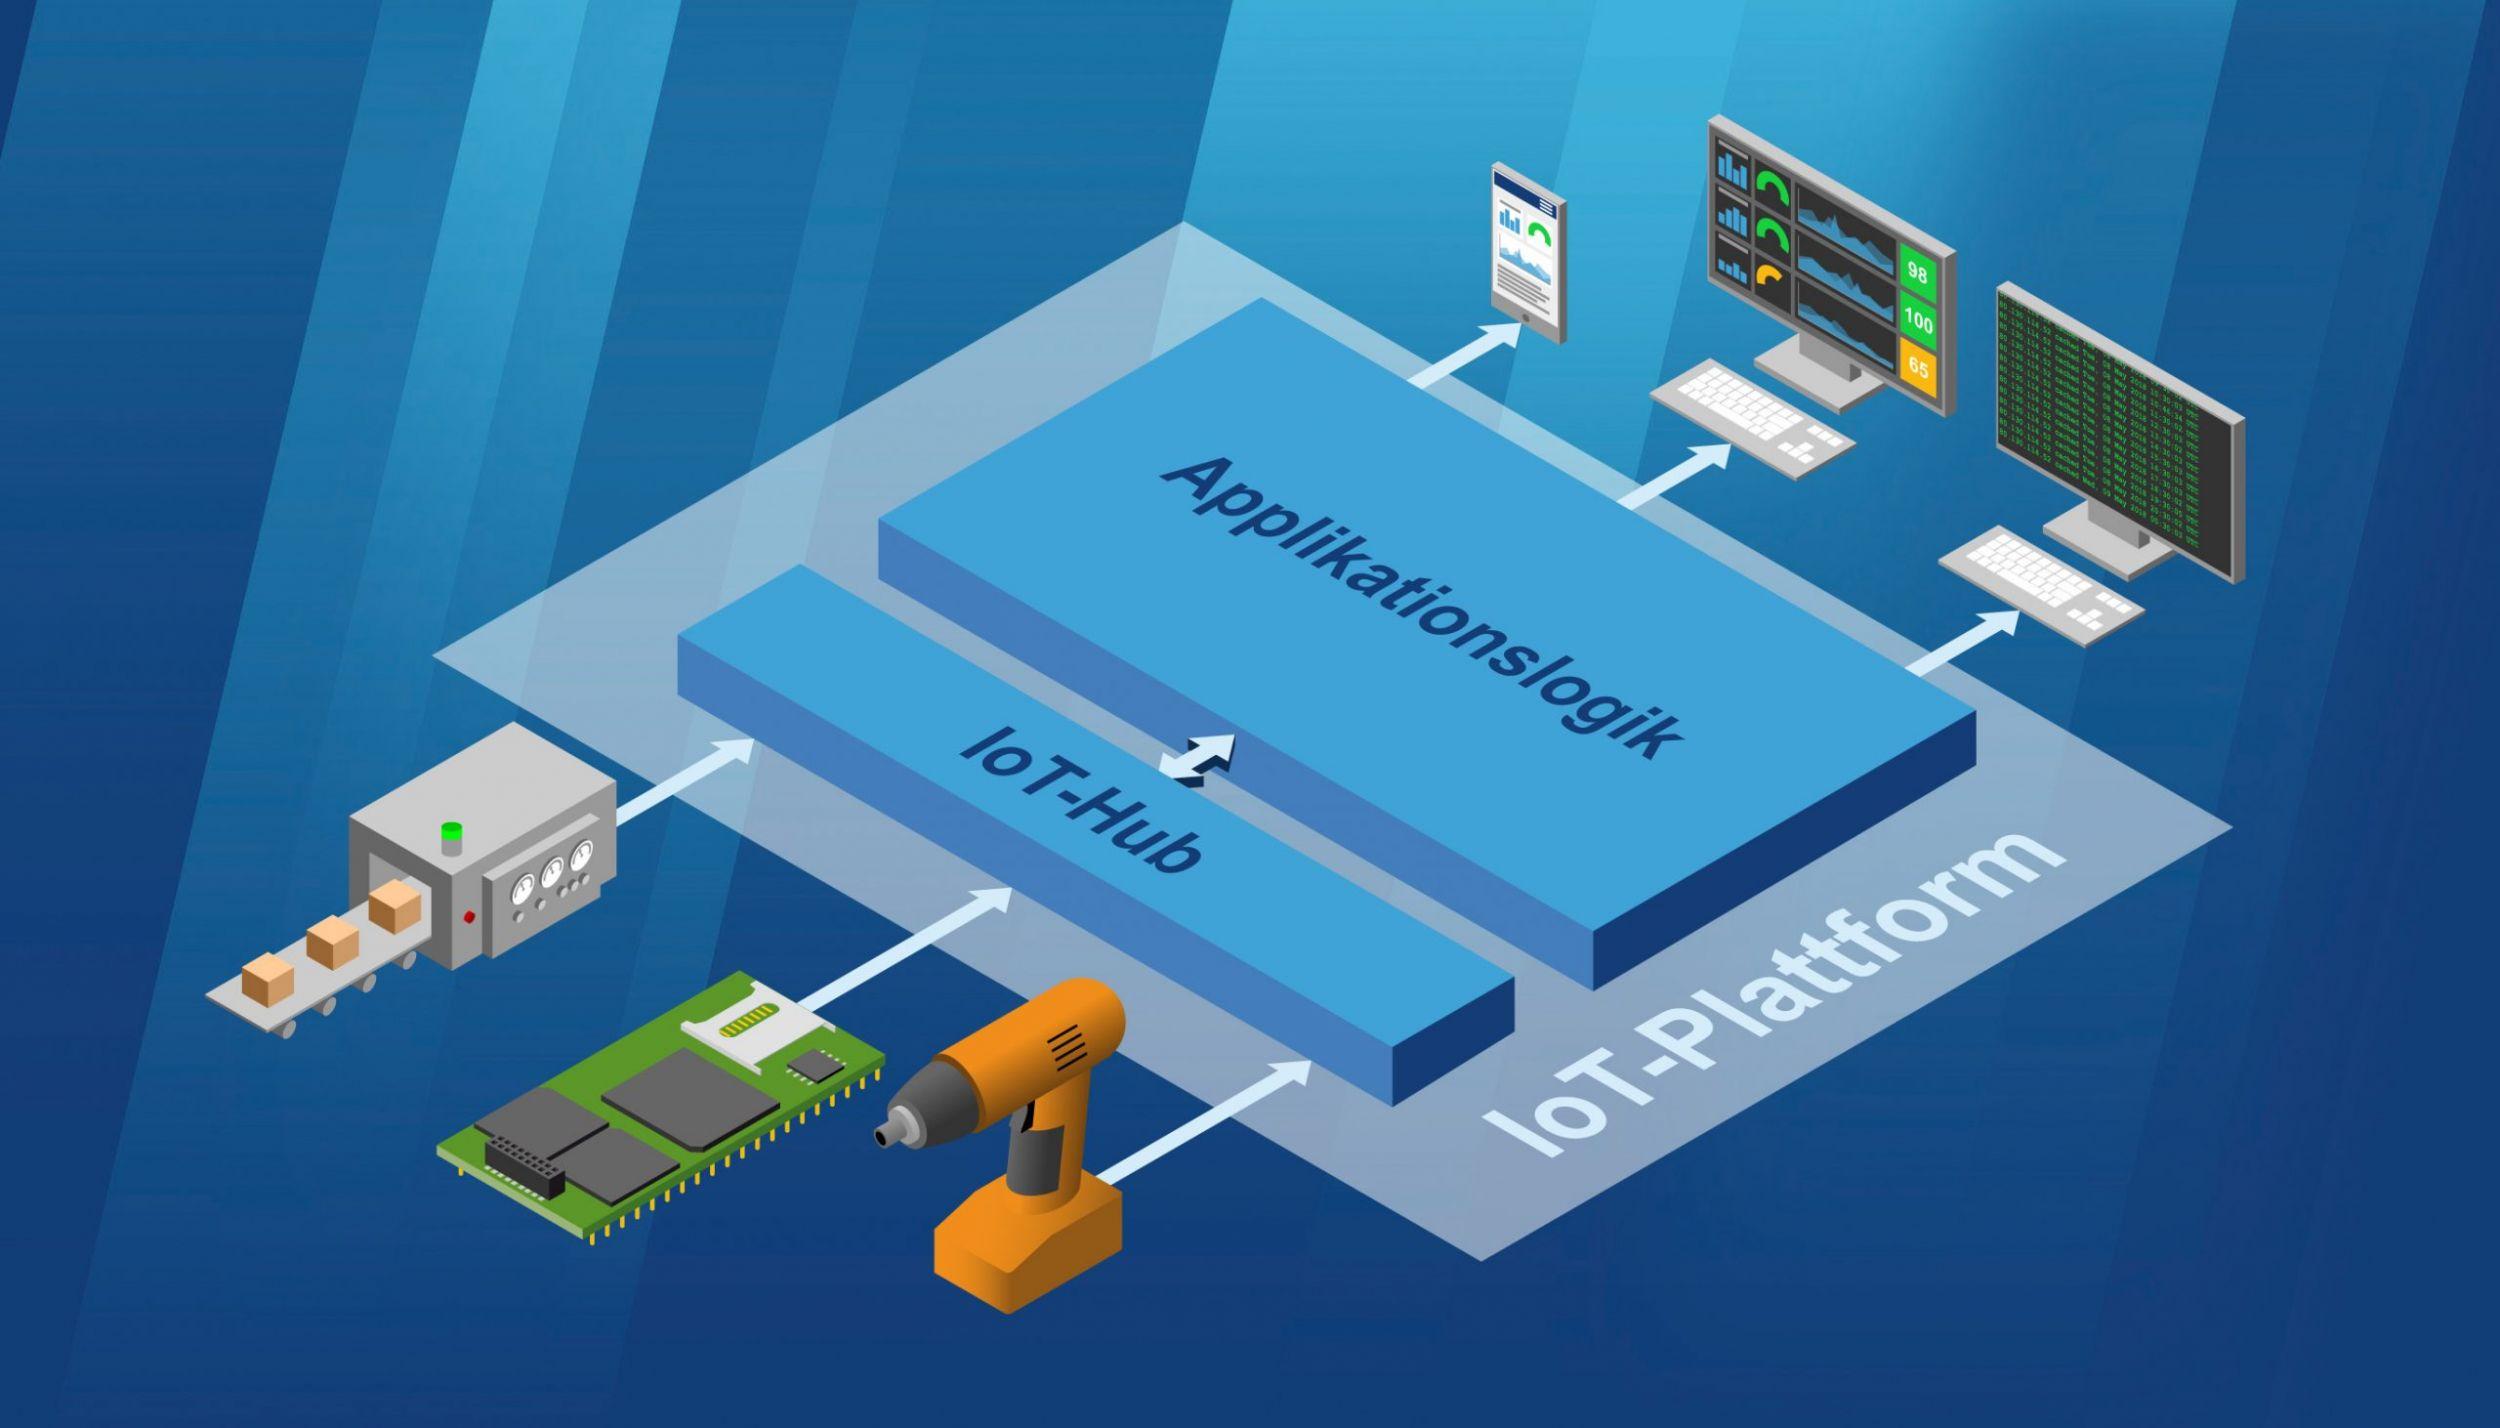 Neues System Development Kit entwickelt